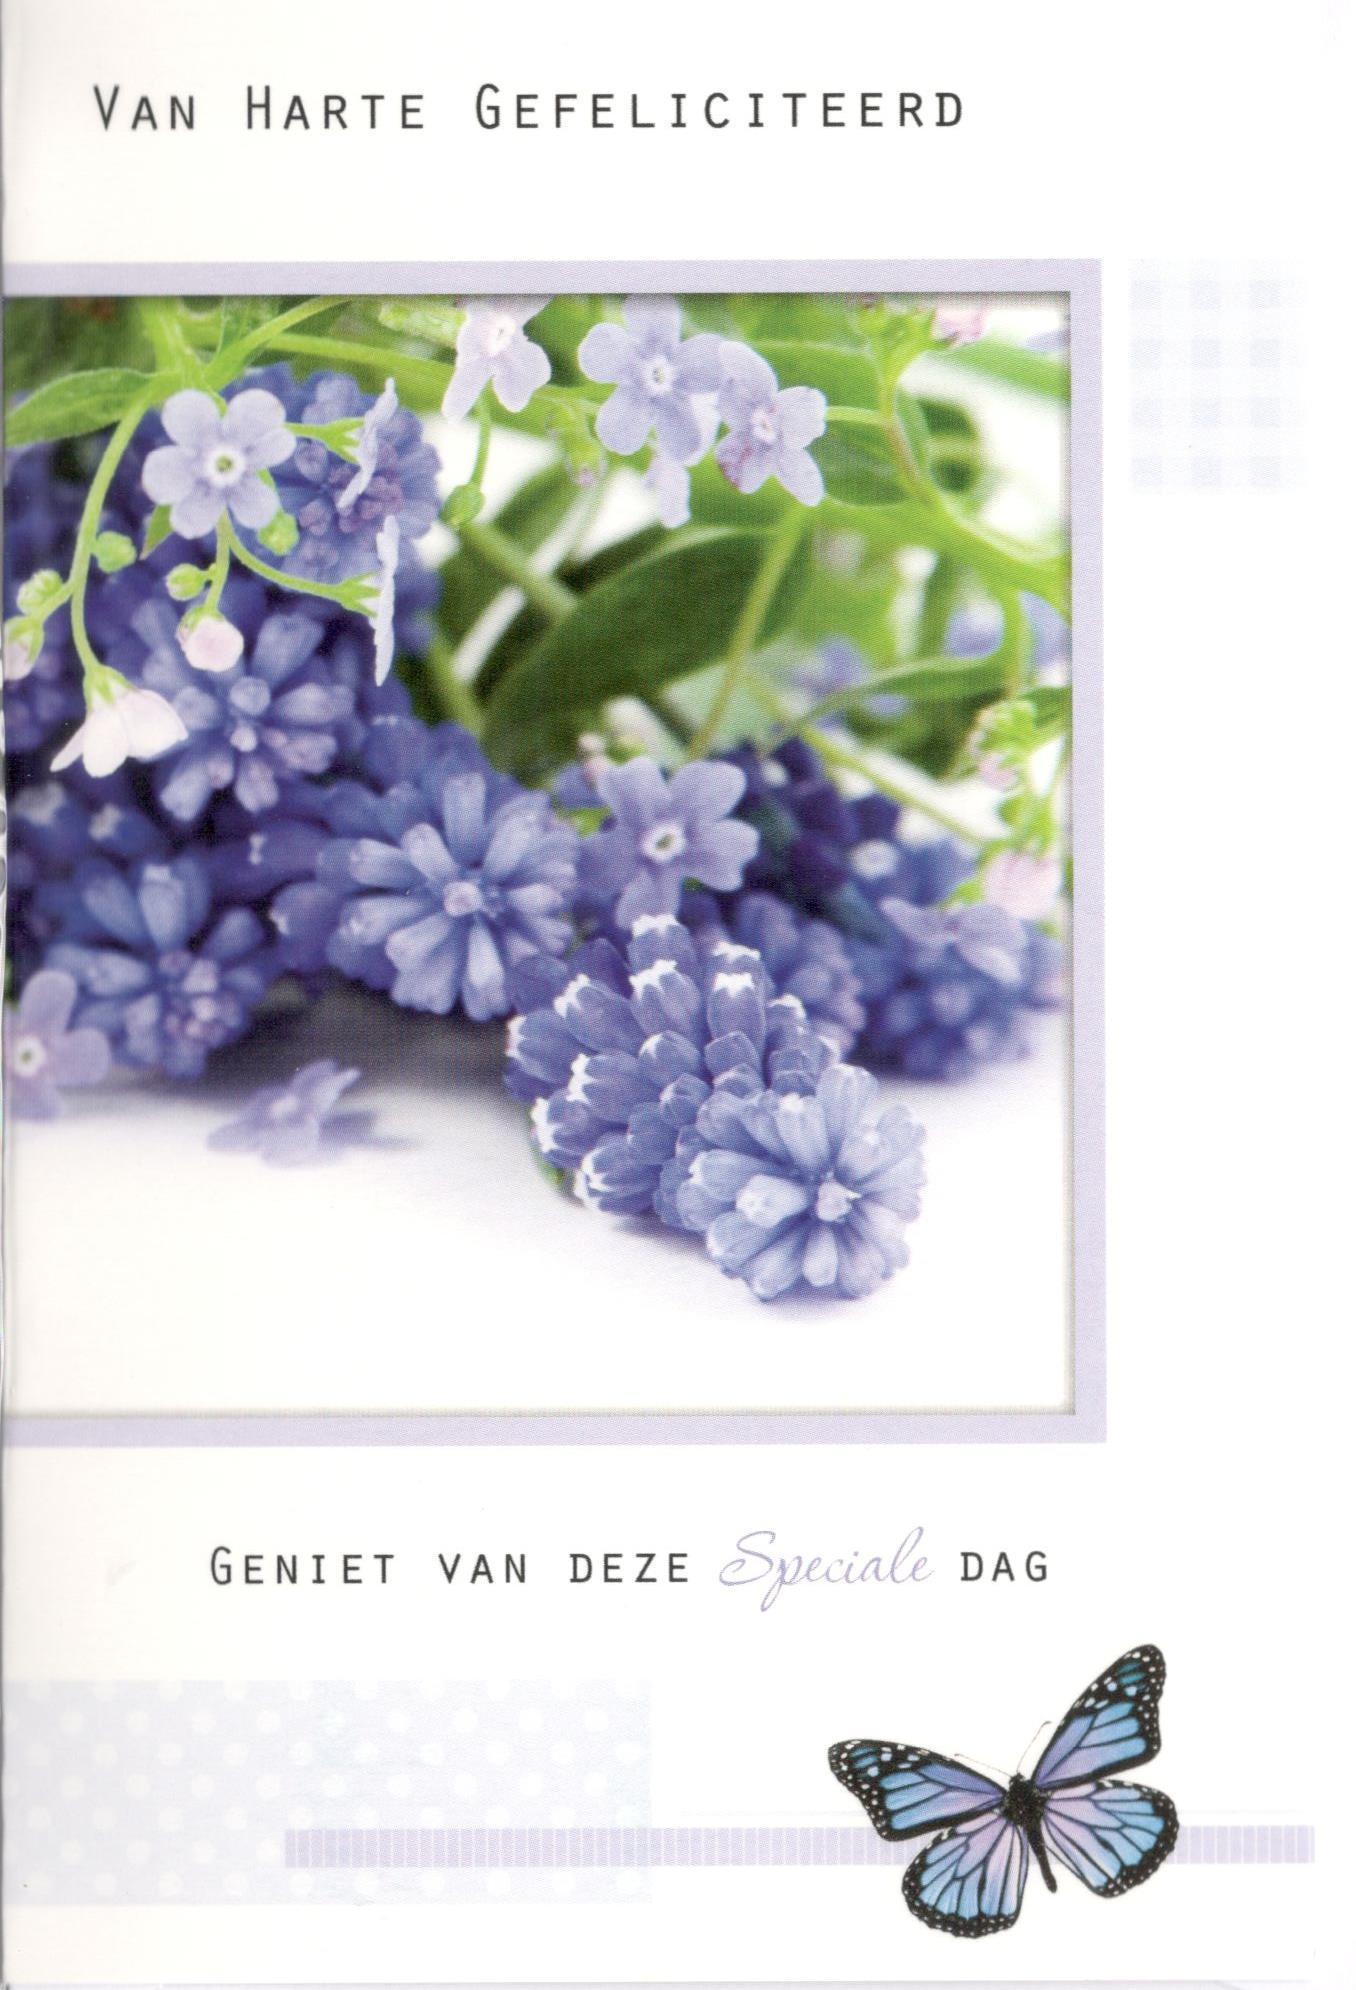 Wenskaart met bloemen mooie tekst